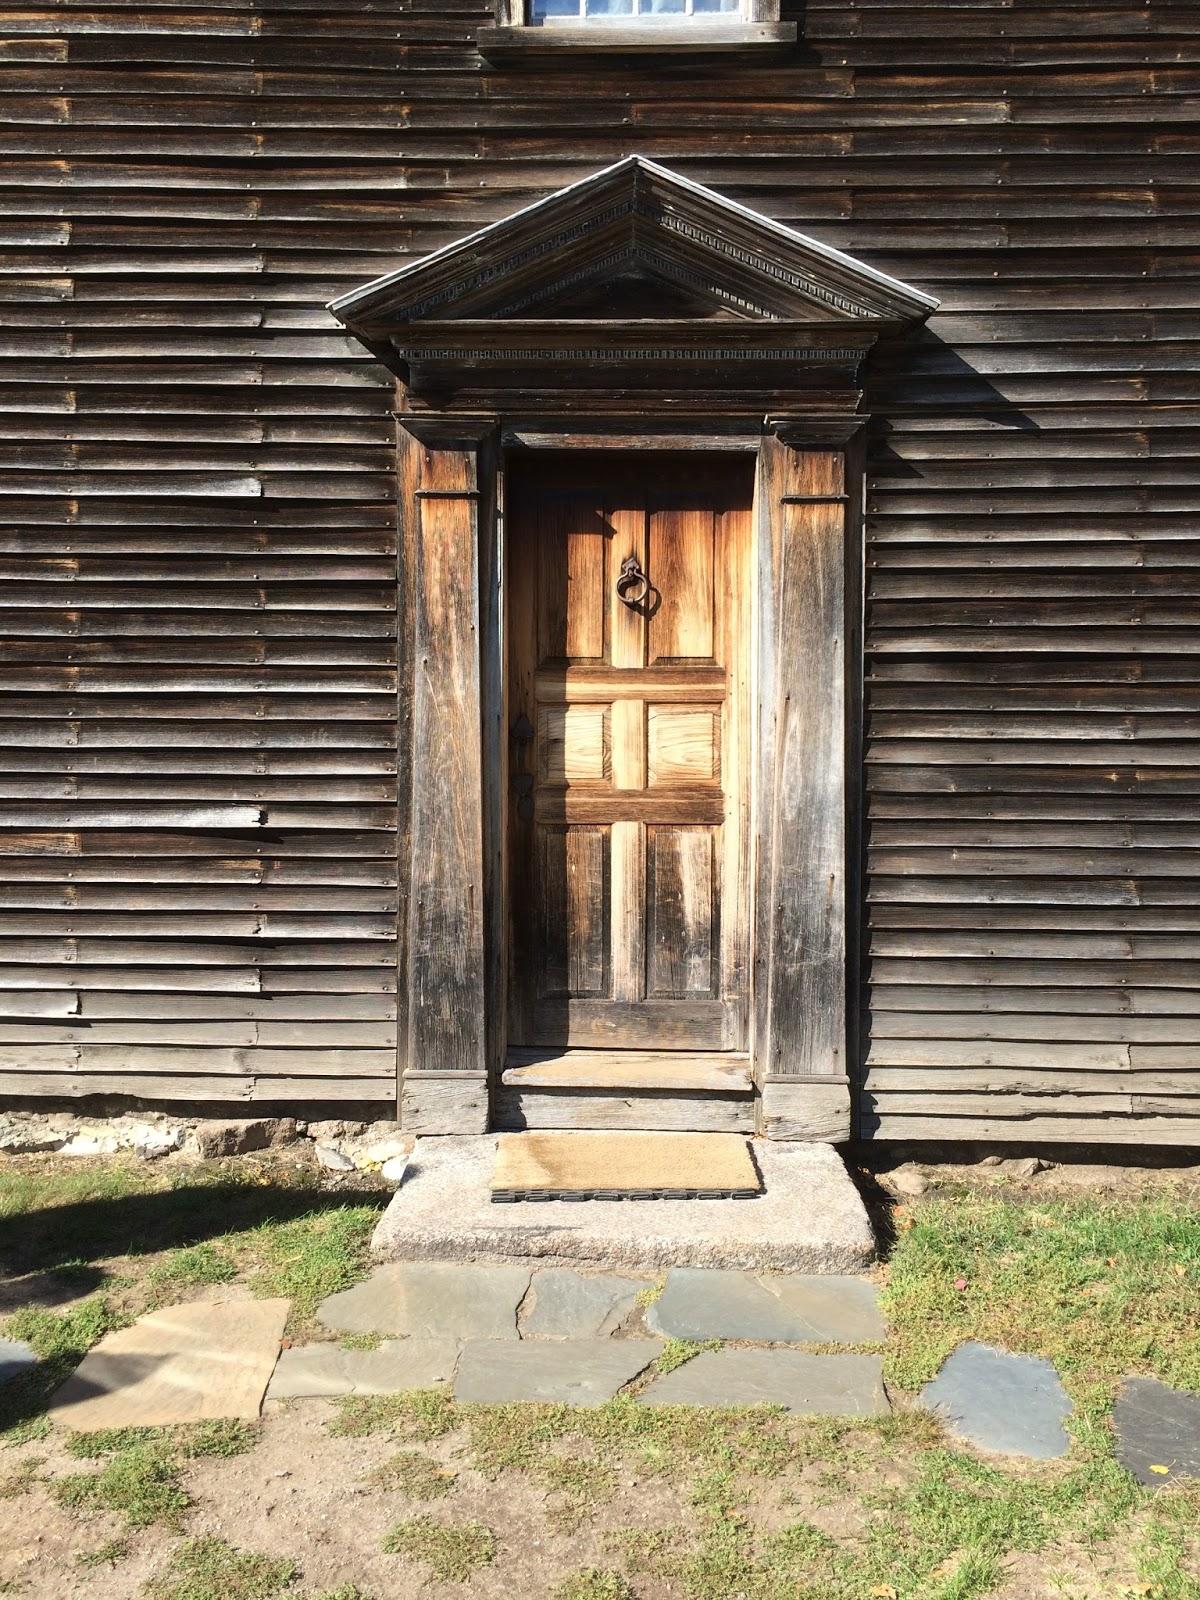 The elaborate front doorway of John Adams' Birthplace, Courtesy of the Calamitous Botanicus blogspot.